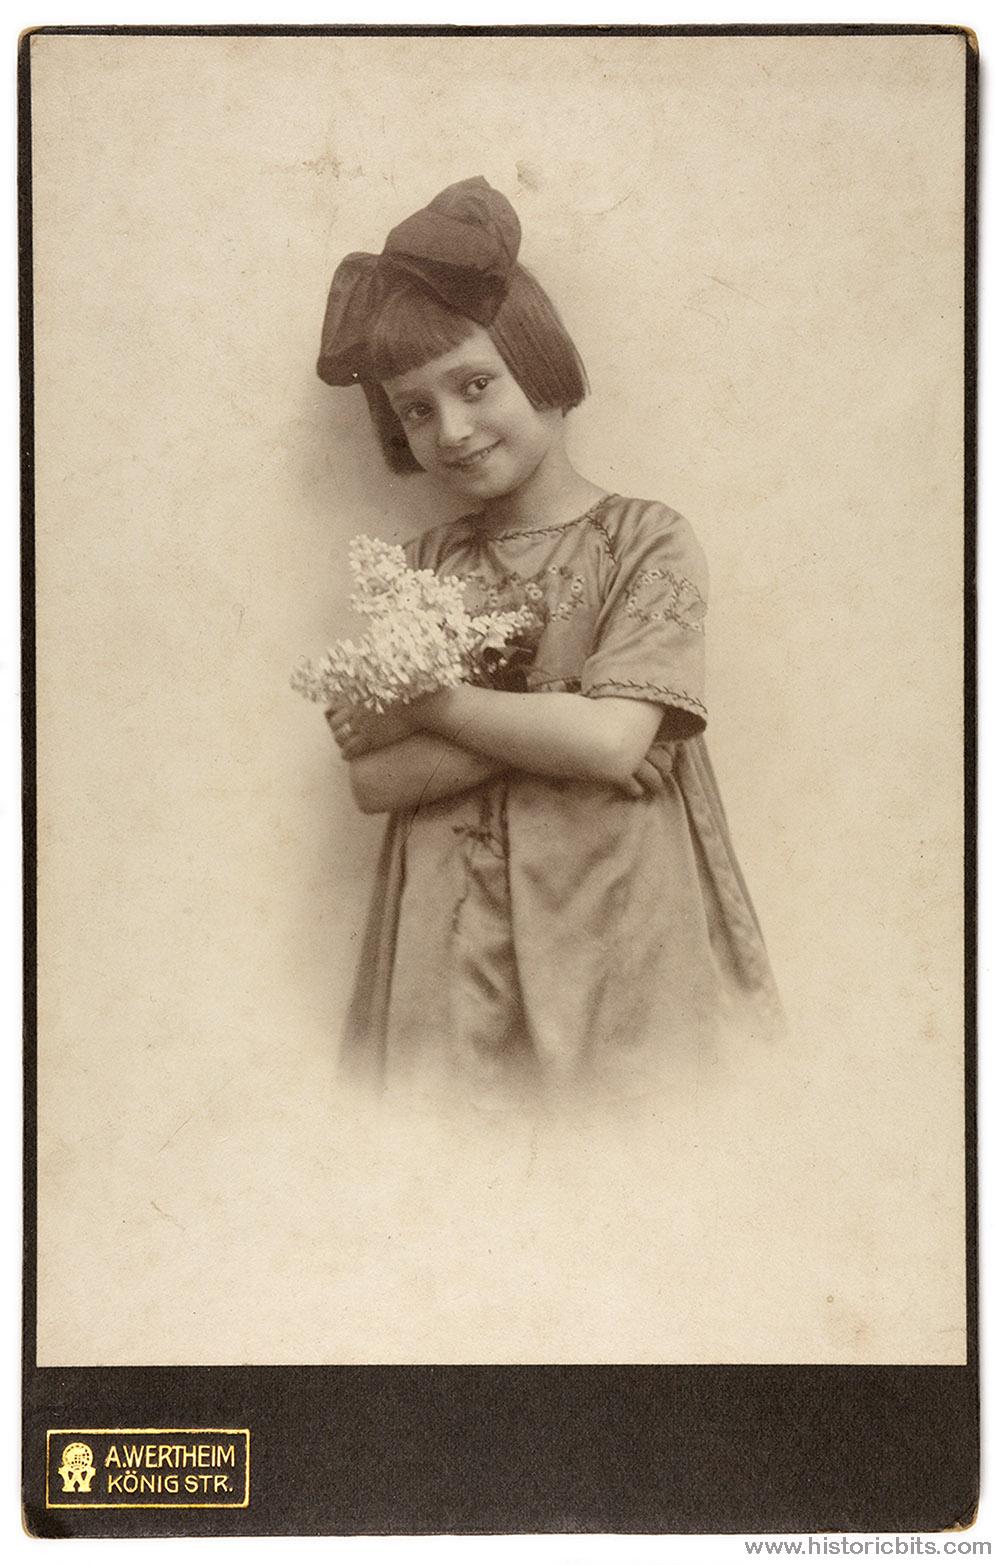 kaufhaus-portraits-a_1 copy